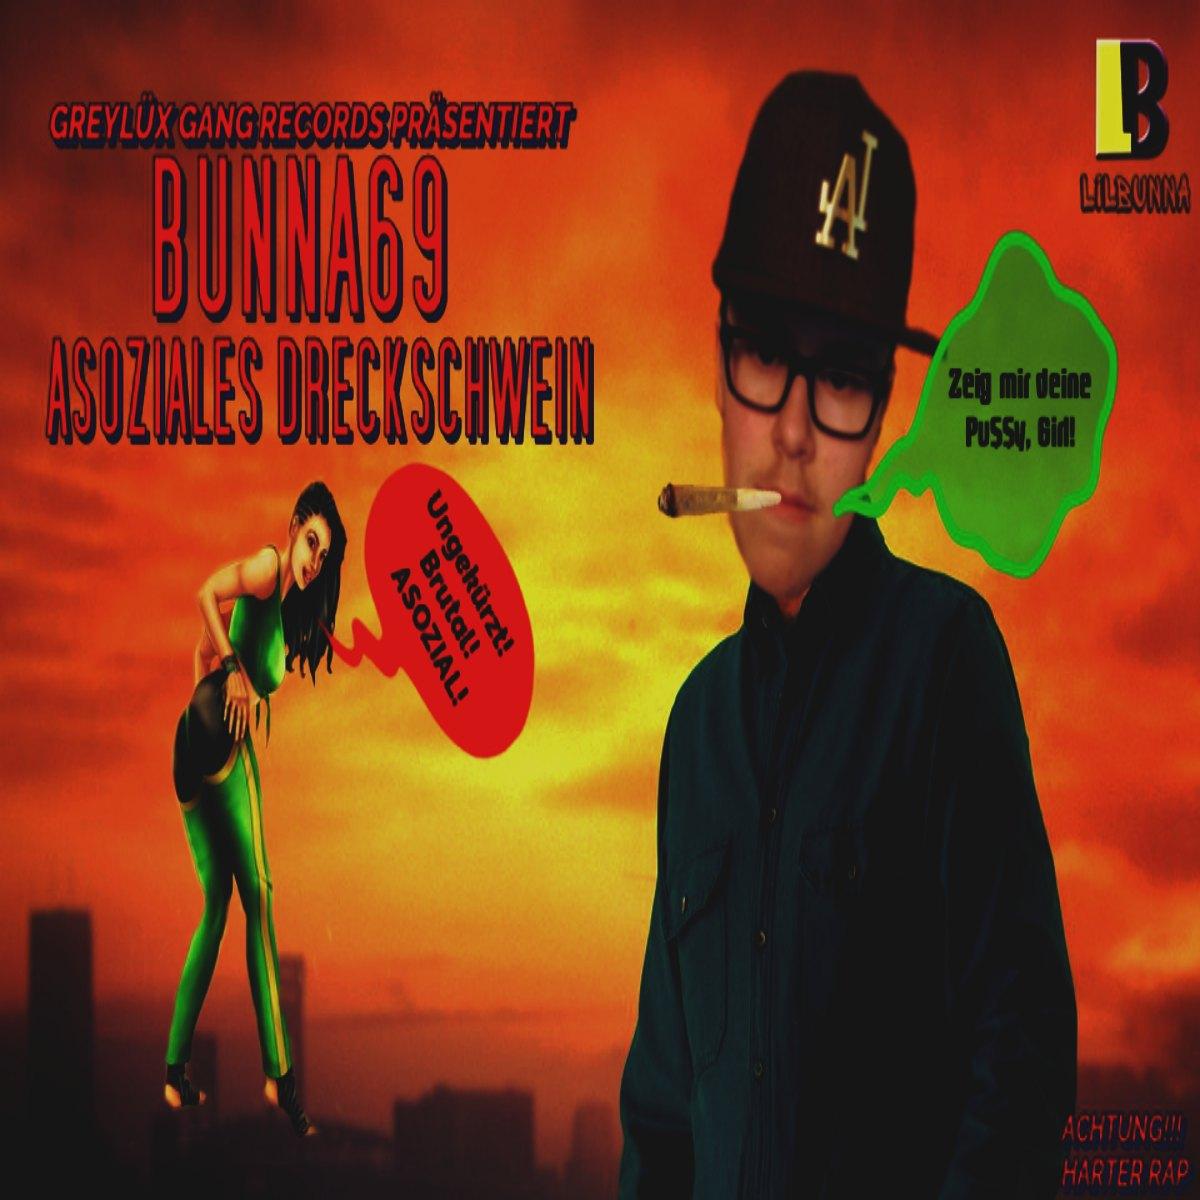 Upcoming: Lil Bunna - Asoziales Dreckschwein